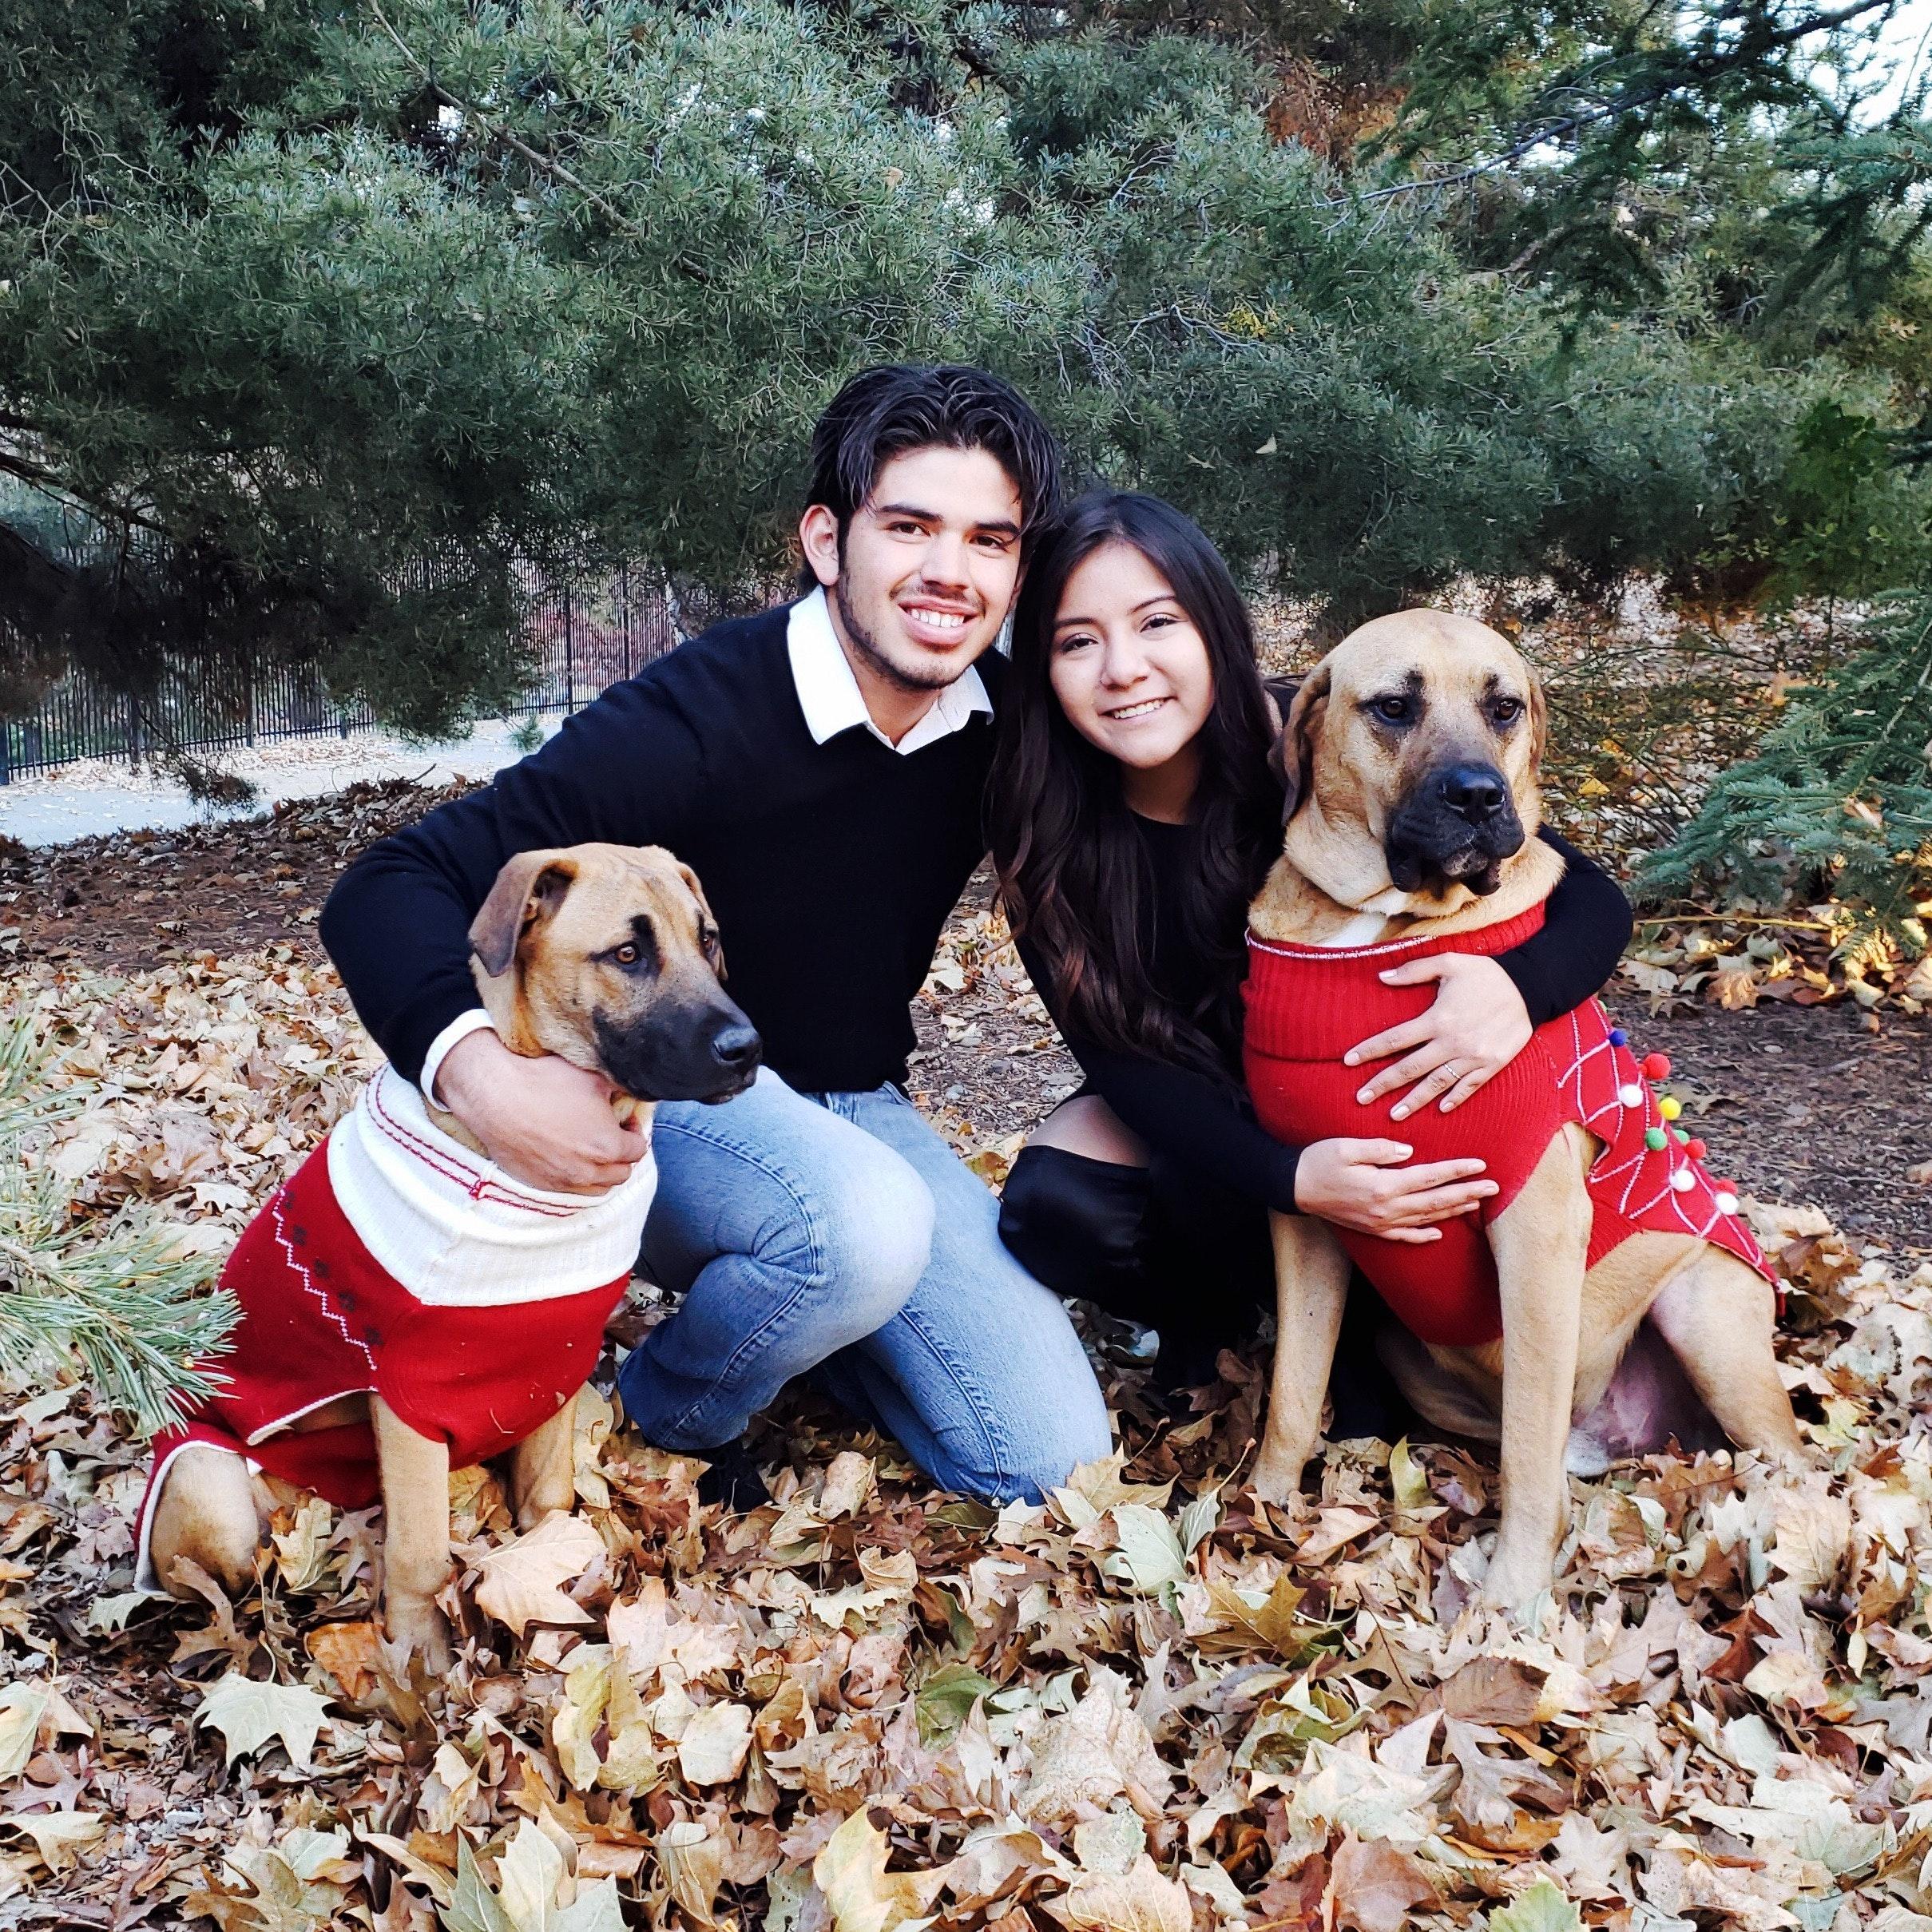 Keibi & Isaias's dog boarding